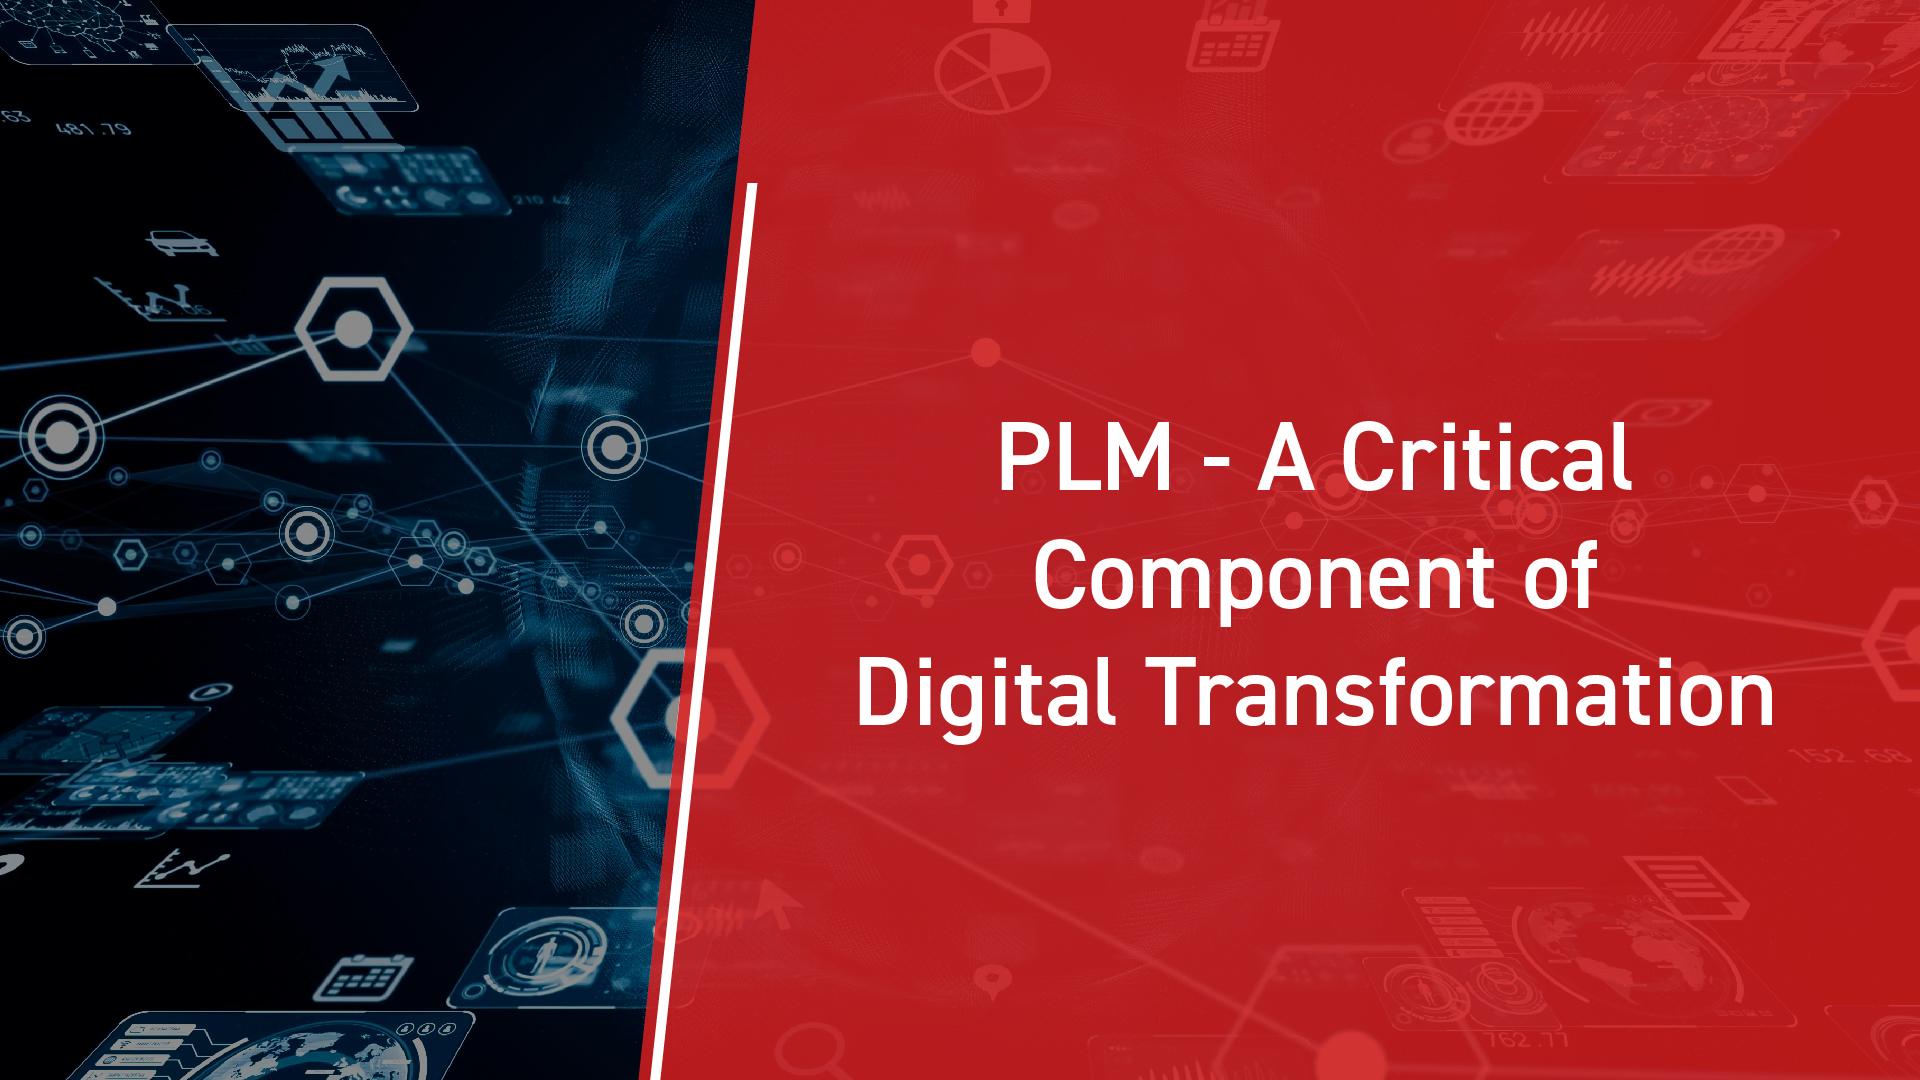 PLM: A Critical Component of Digital Transformation